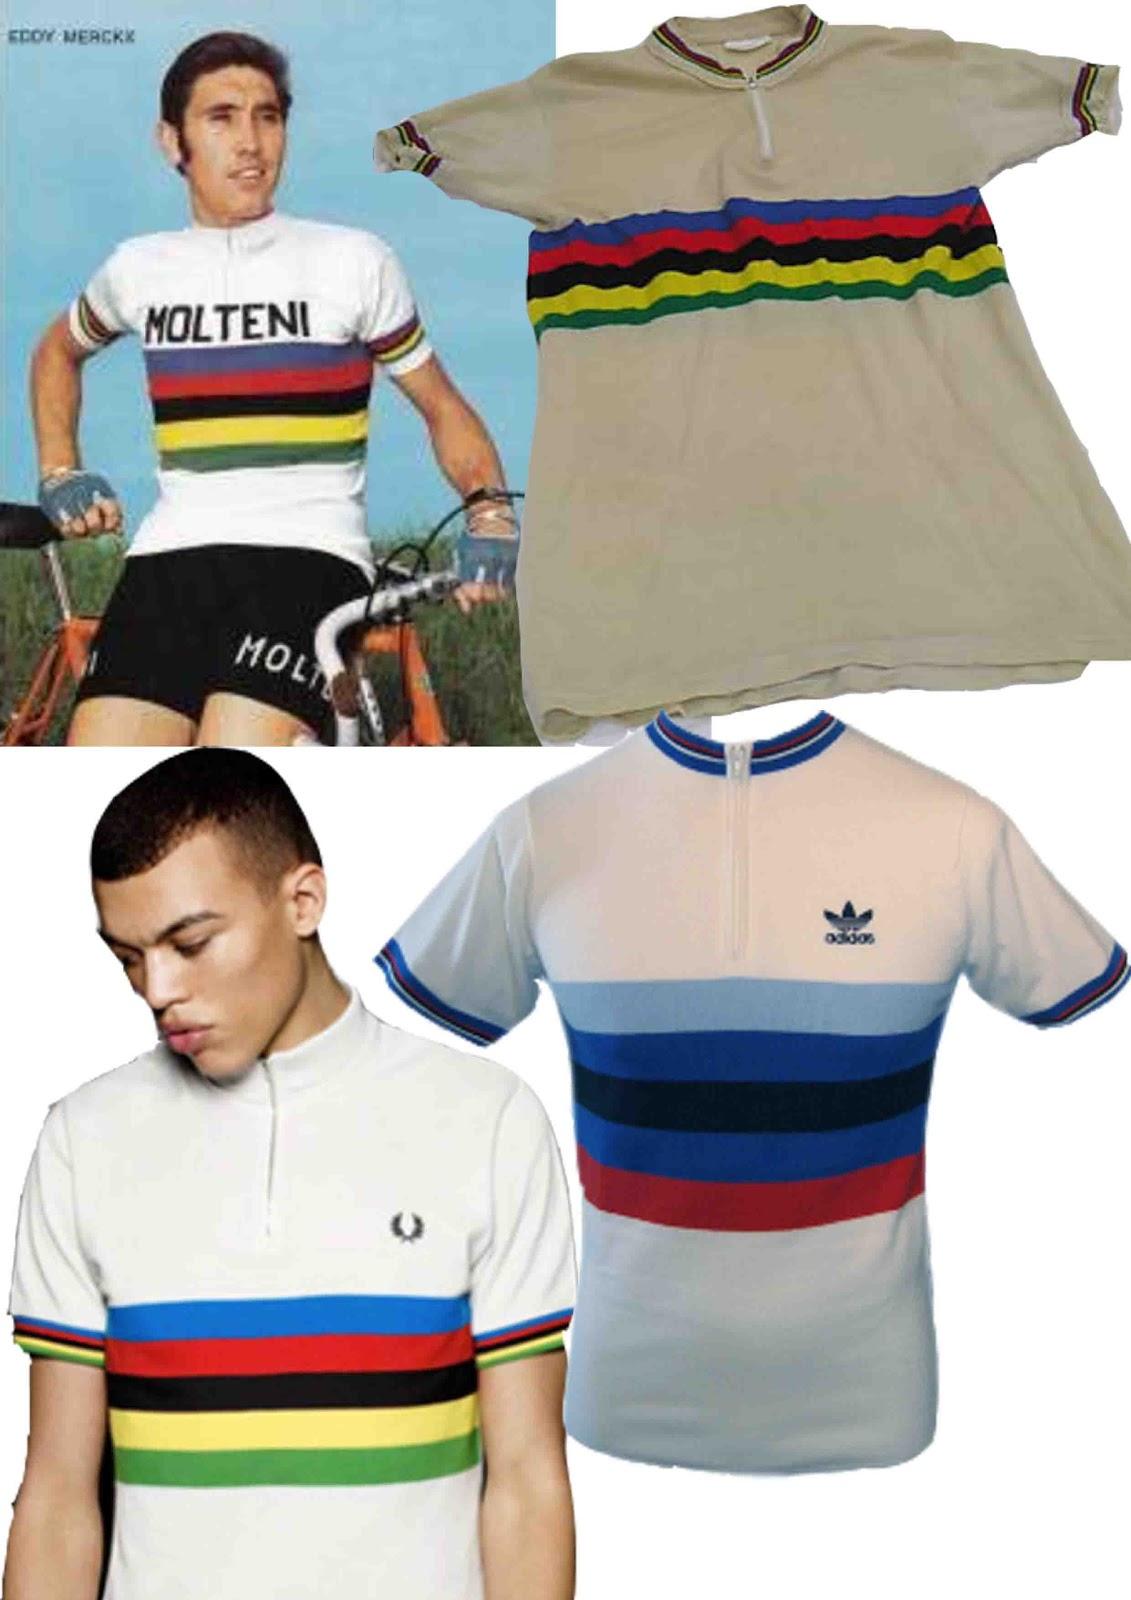 Mens Collections  World Champion Eddy Merckx 70 s Molteni Vintage ... 1c1143be0